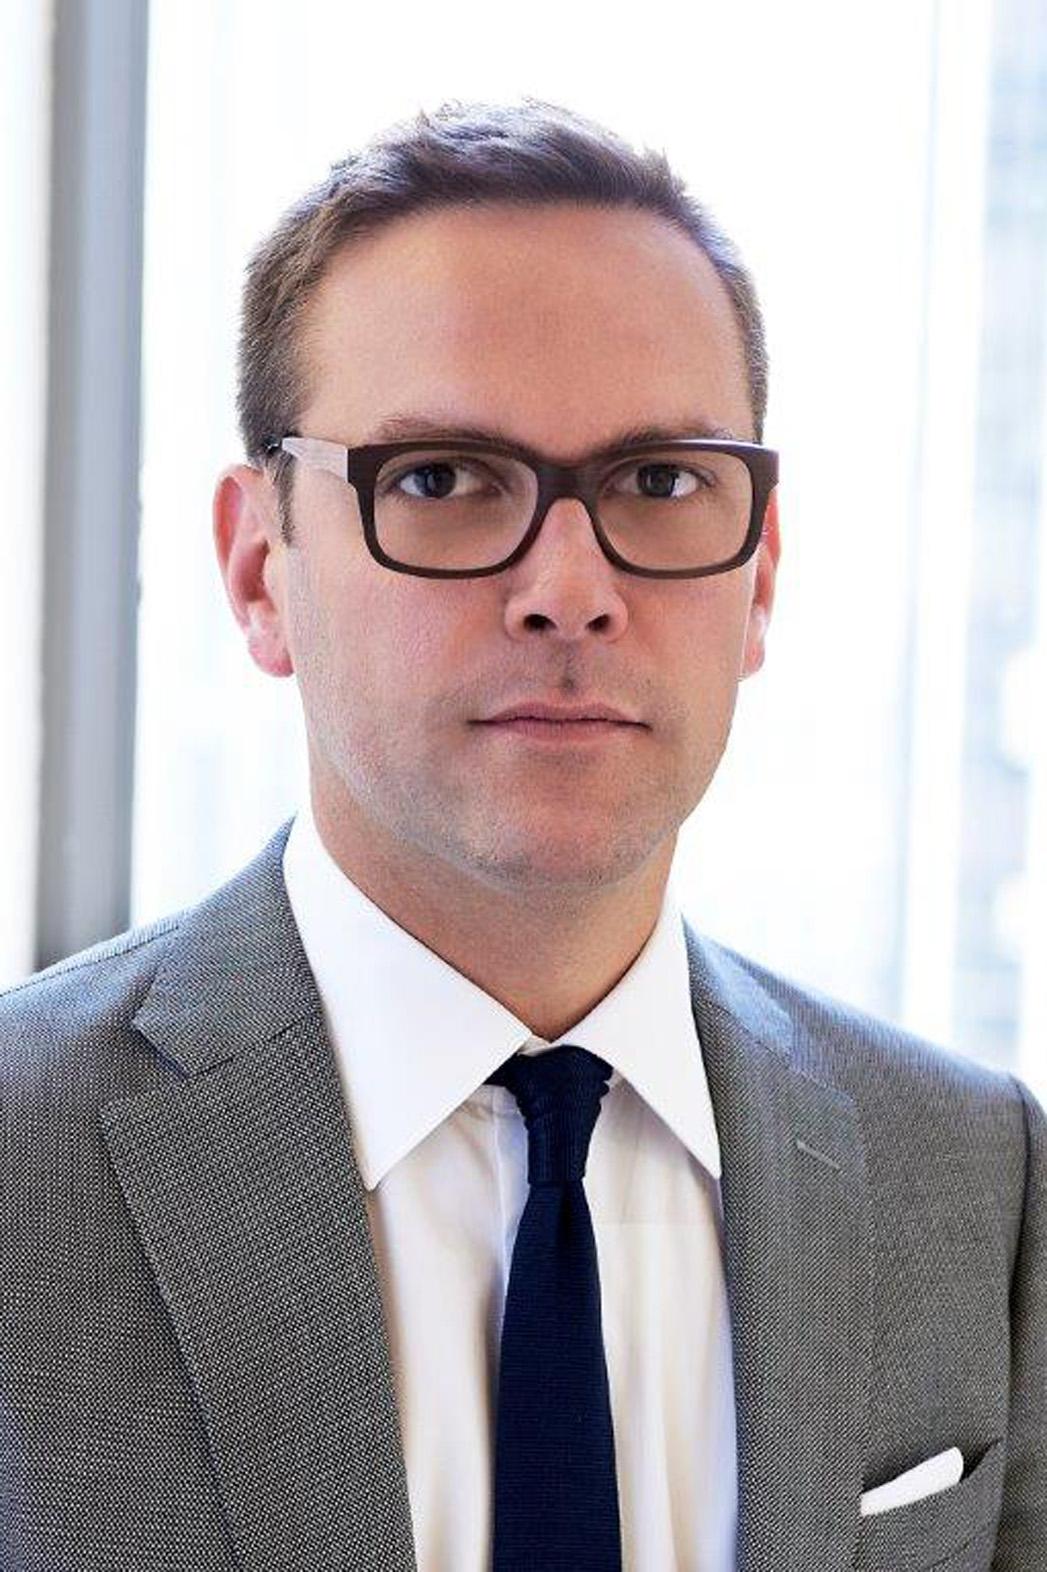 James Murdoch Headshot - P 2013